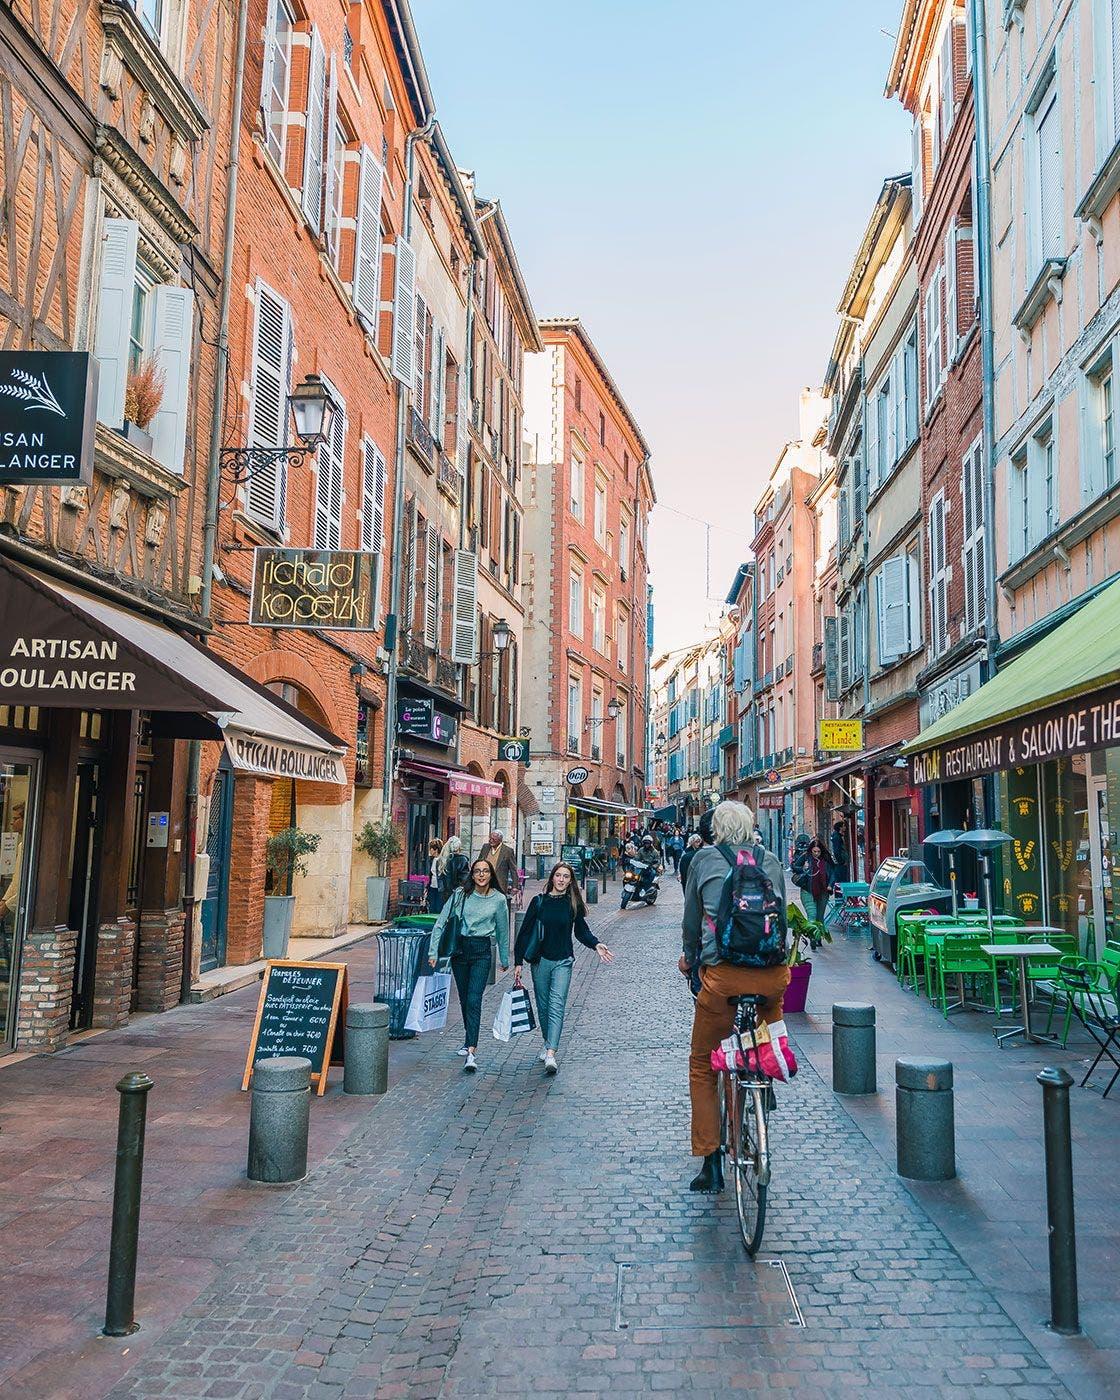 Existe un sistema público de bicicletas con 2.400 vehículos. Foto Turismo de Toulouse.